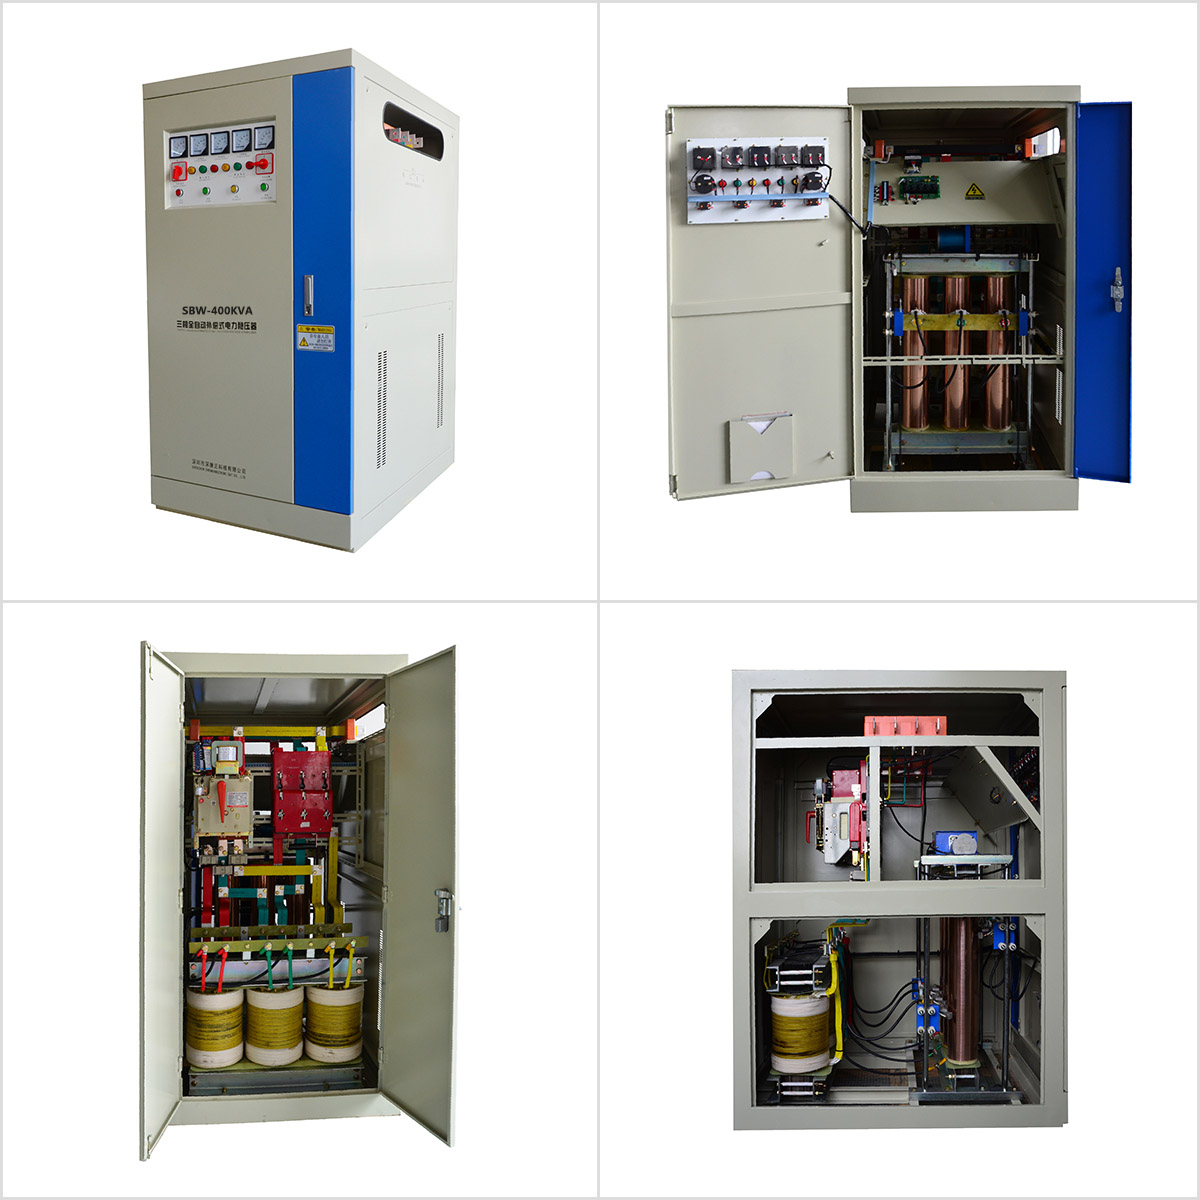 SBW Voltage Stabilizer 400KVA